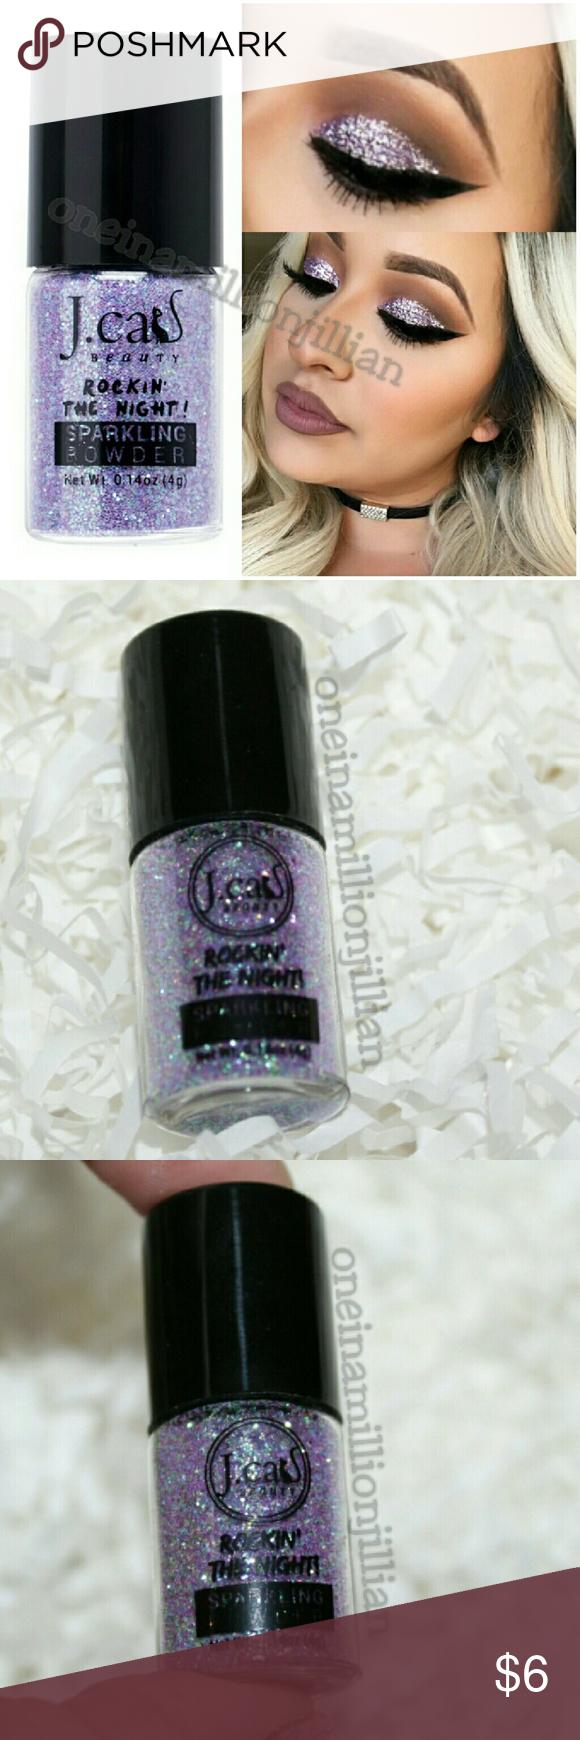 RESTOCKED! Iris Indigo Loose Glitter It cosmetics